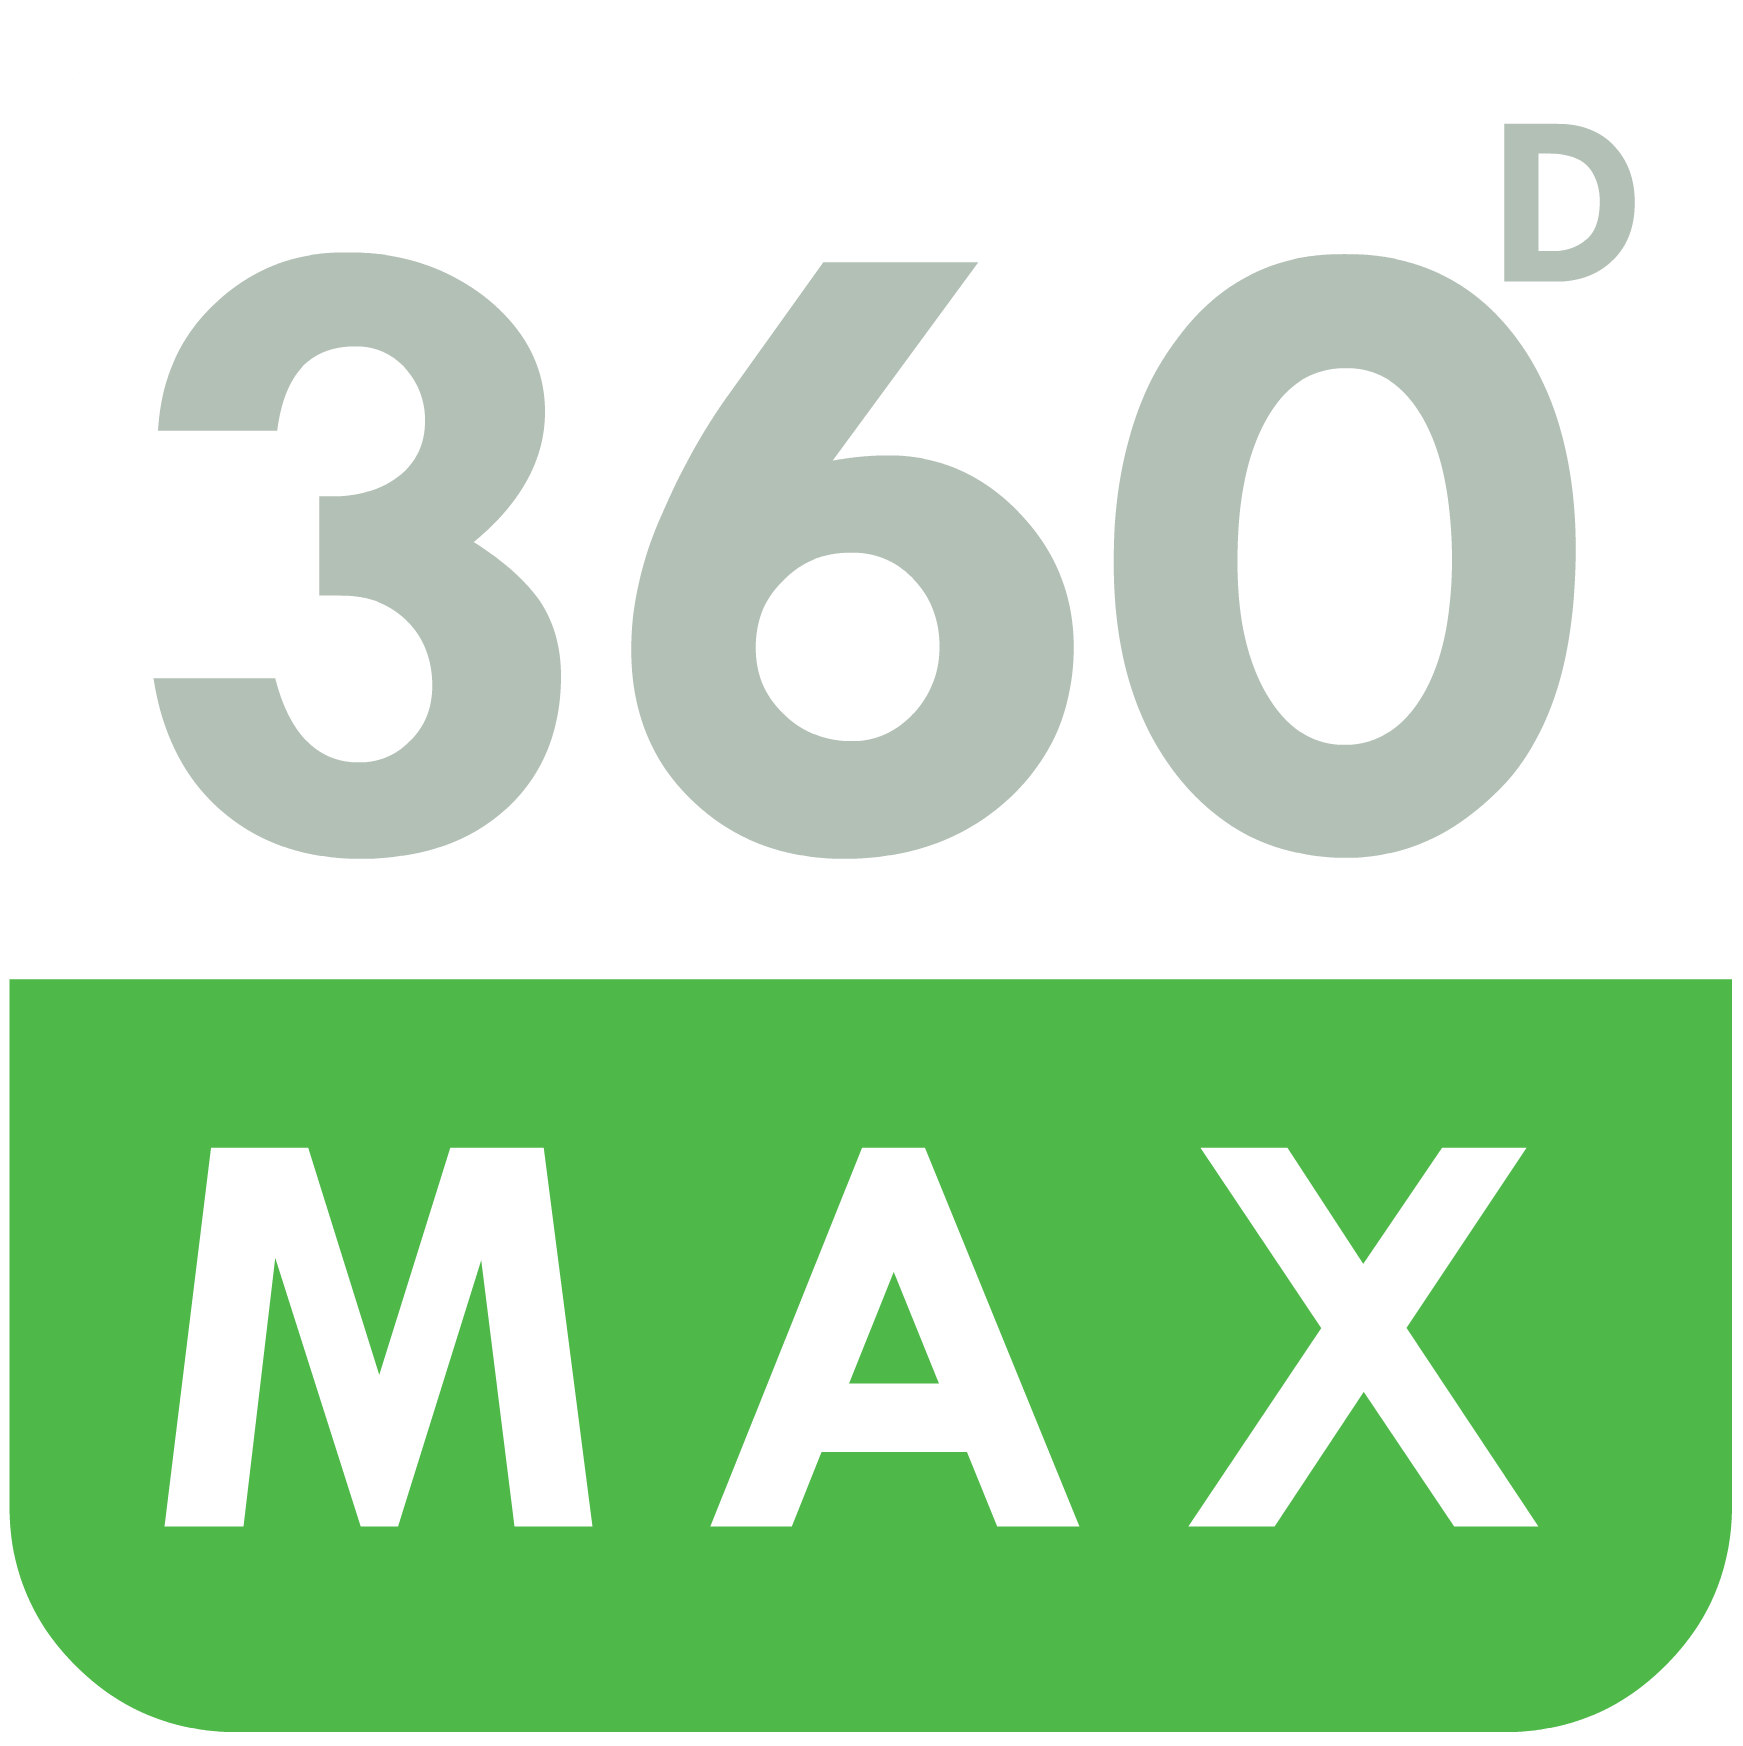 360DMAX